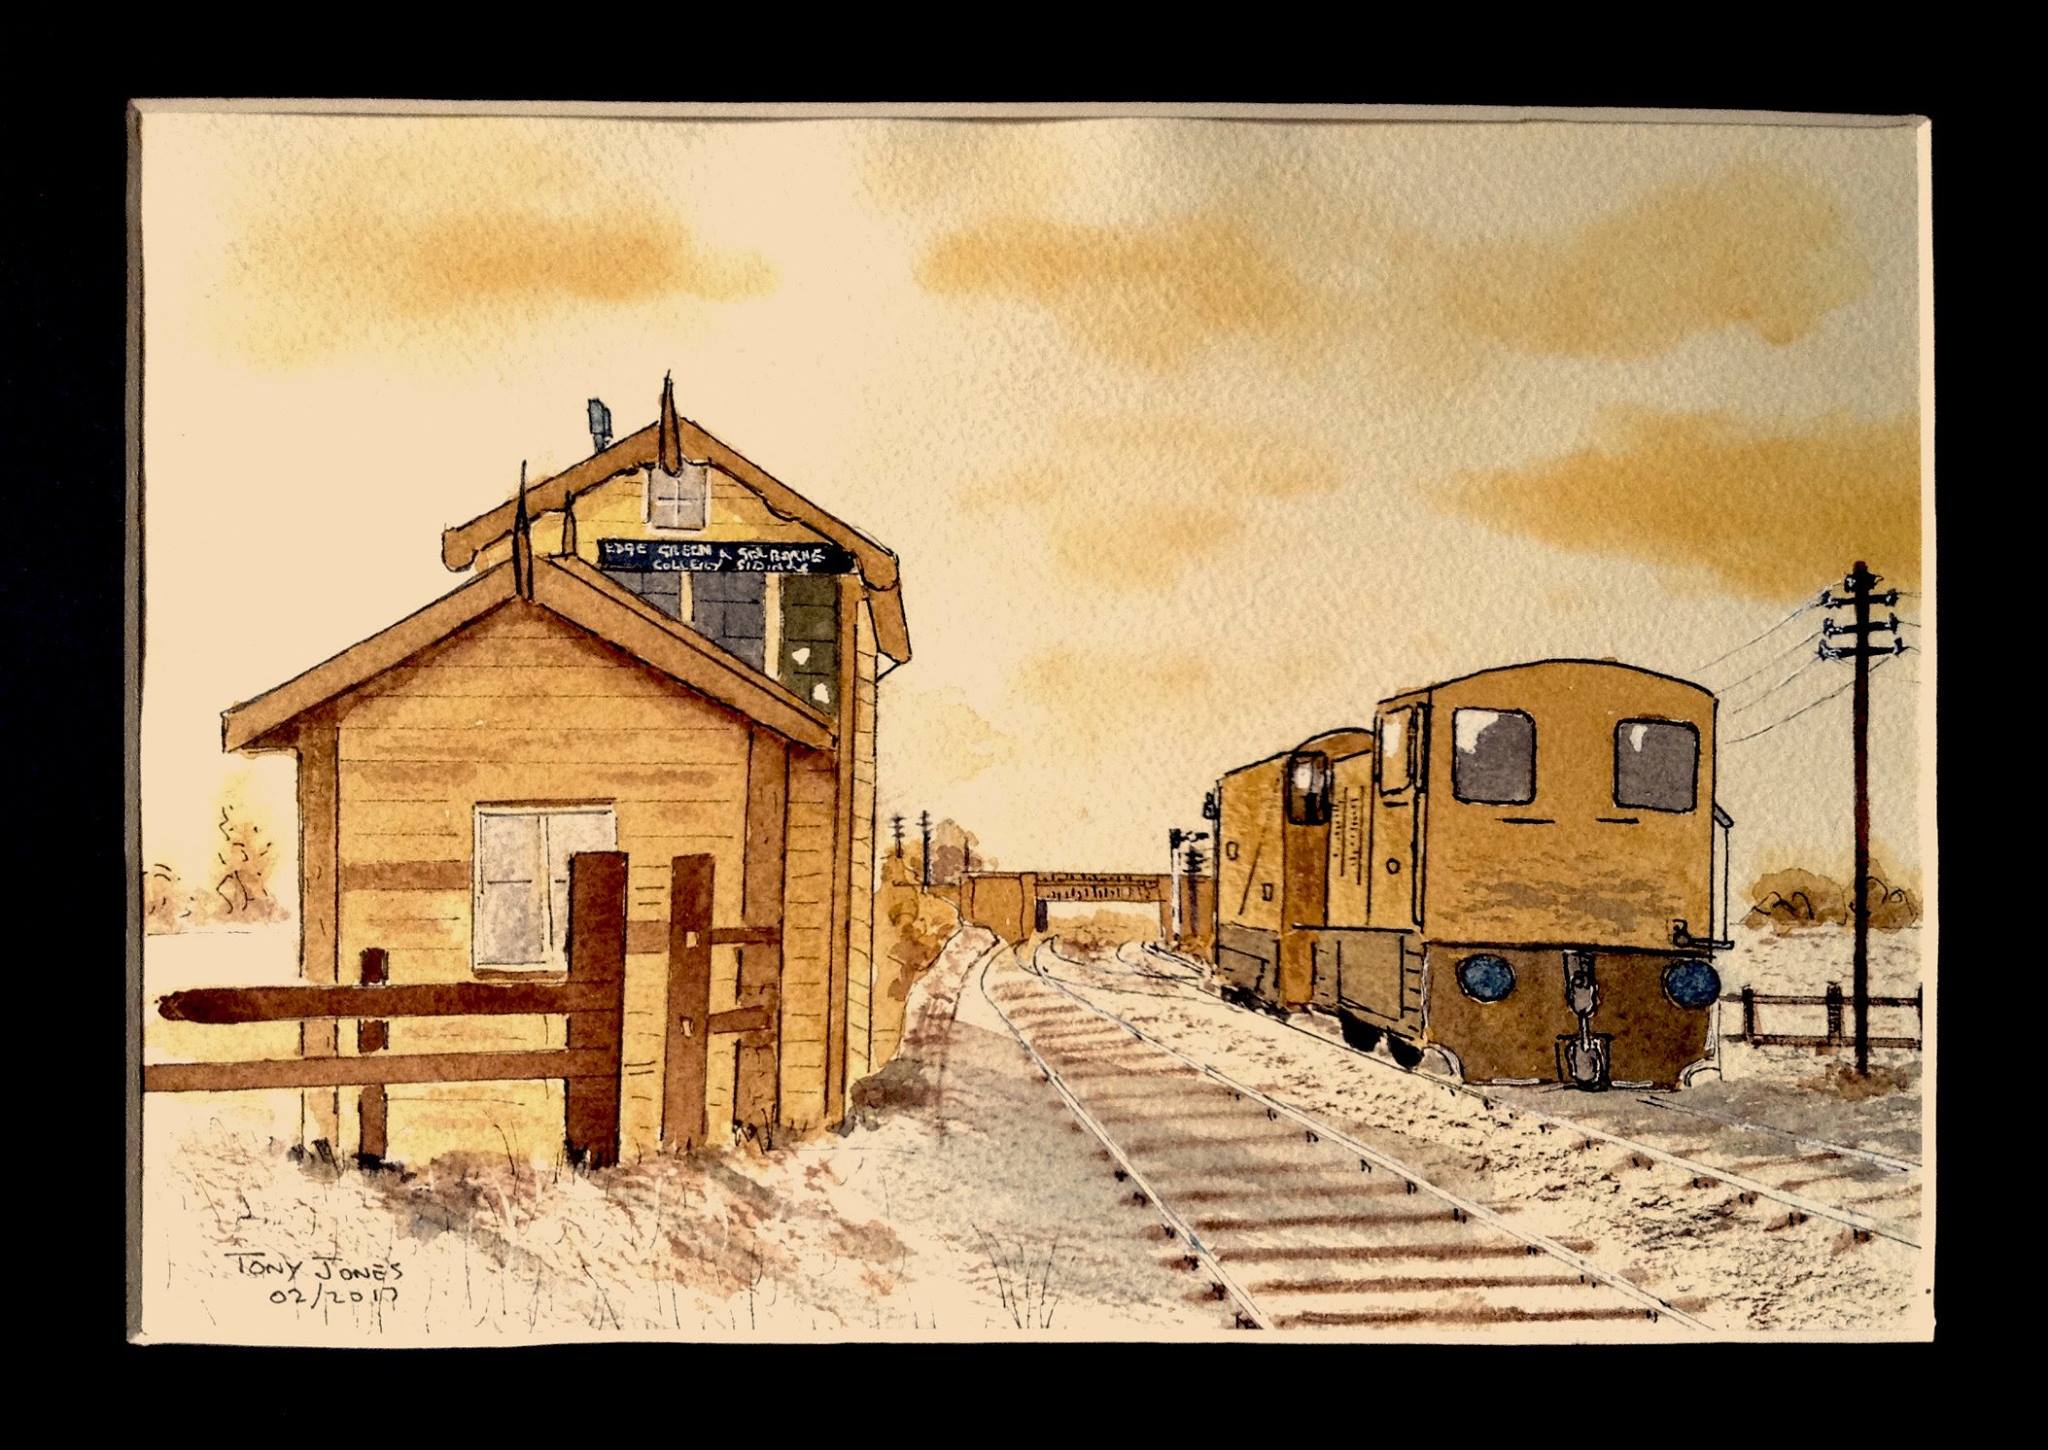 Edge Green and Golborne Collery sidings by Tony Jones